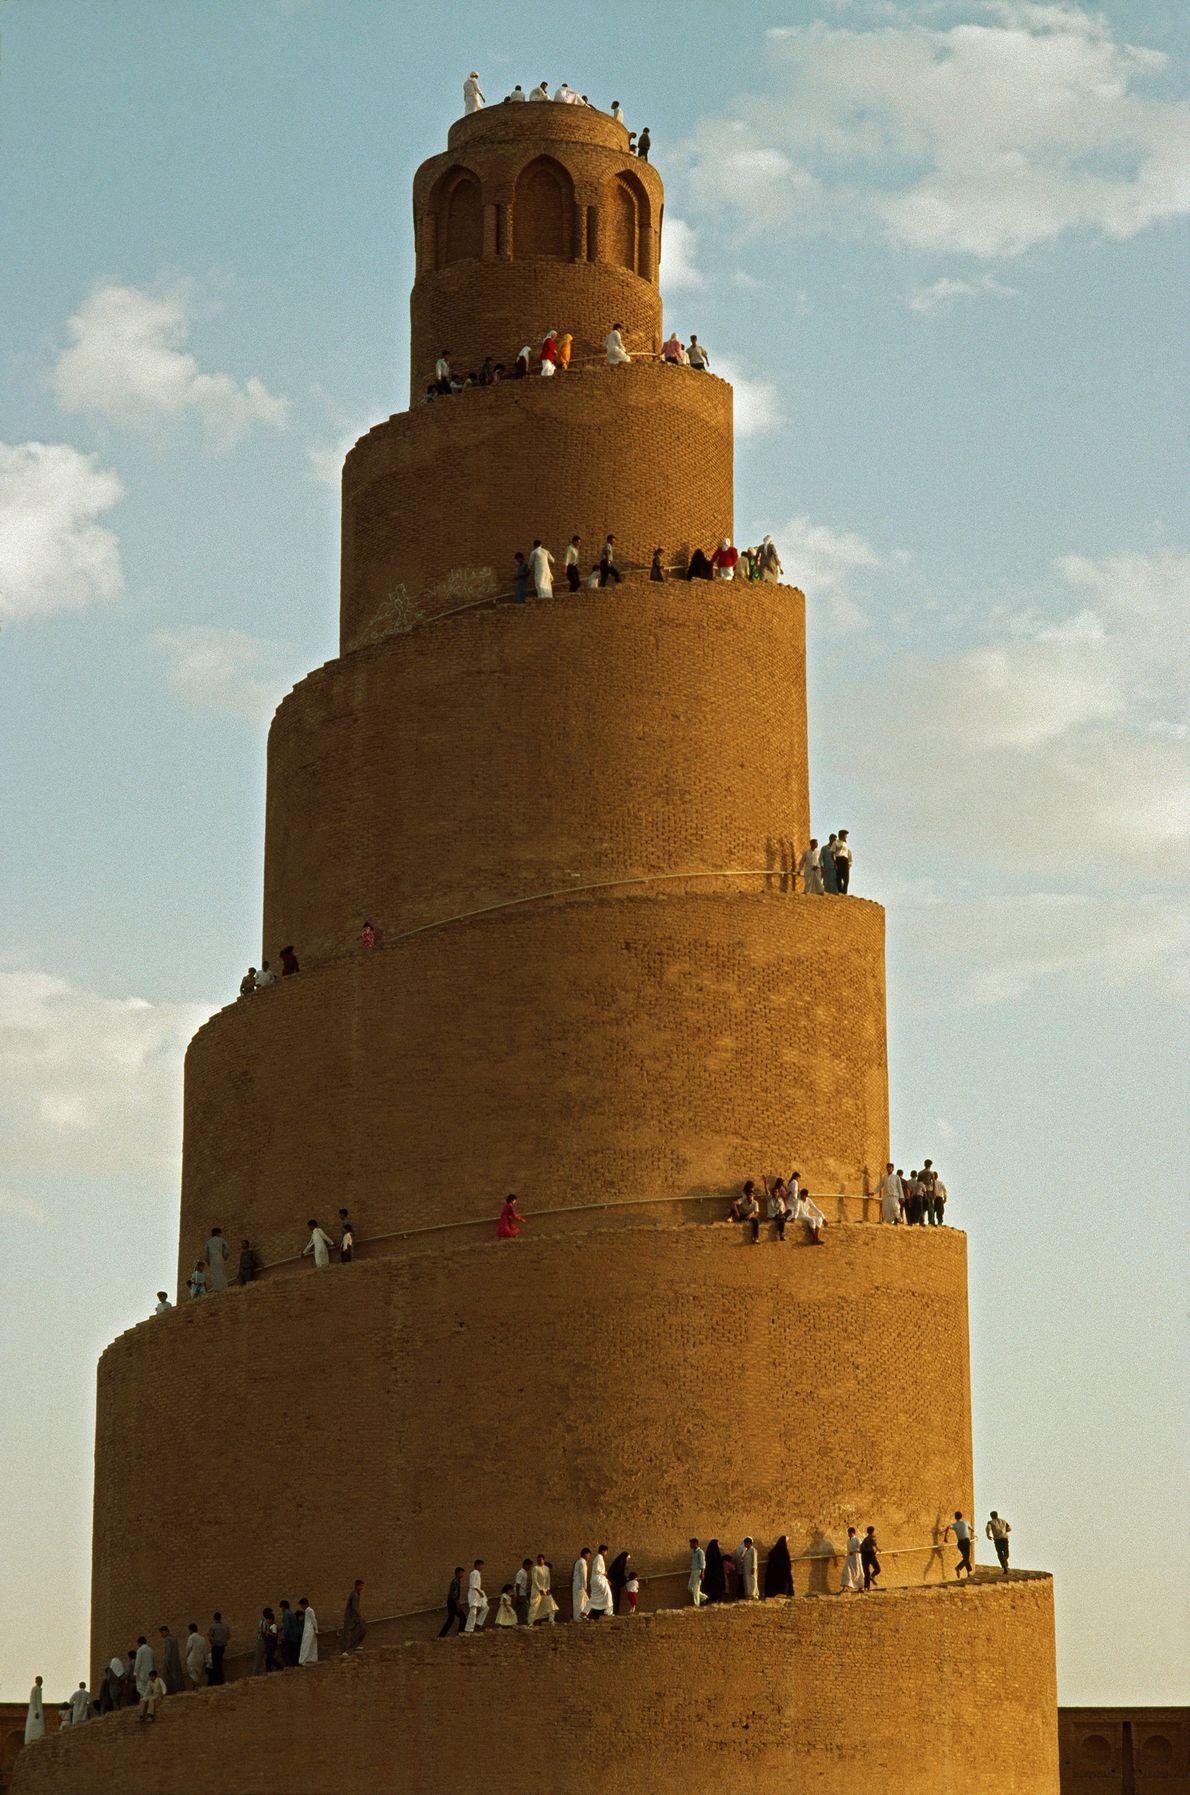 Samarra Archaeological City, Iraq